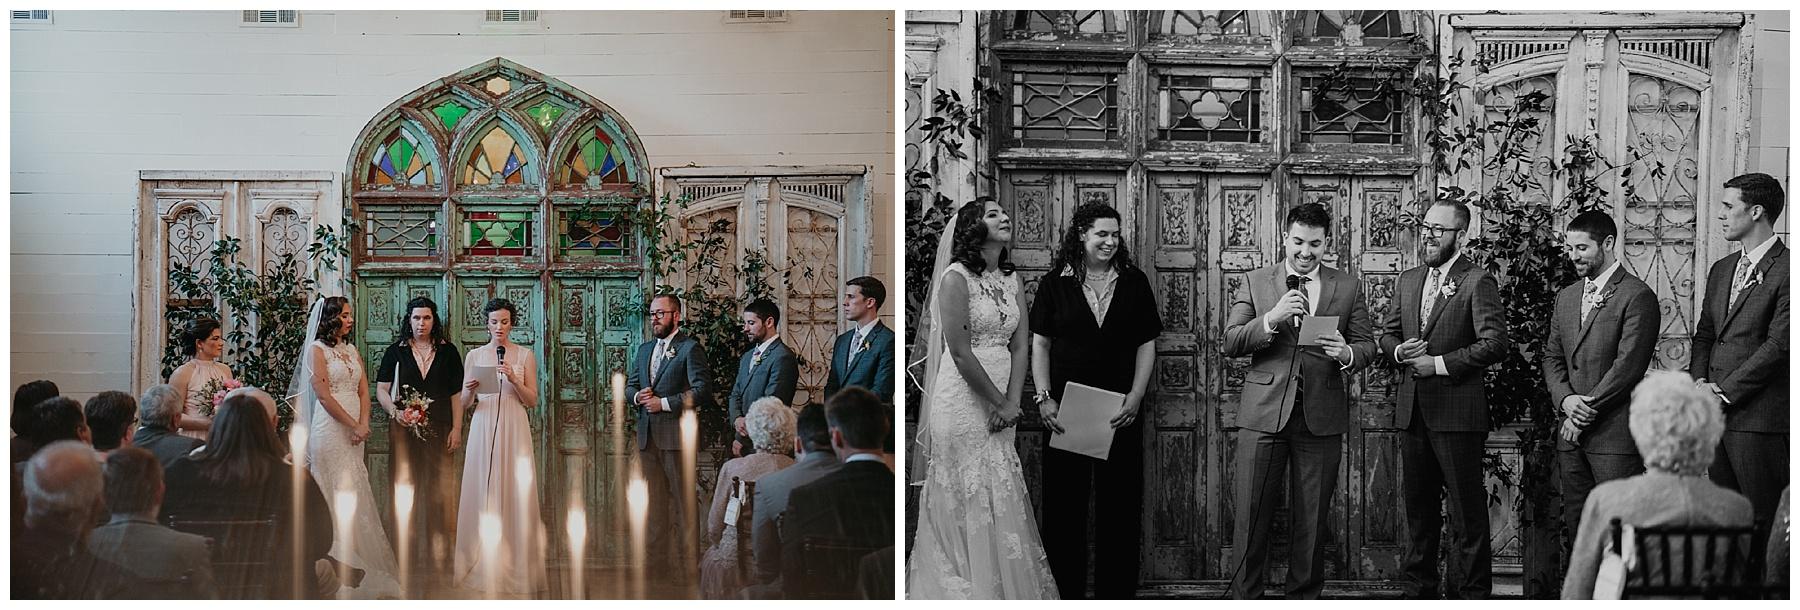 the_ravington_wedding_arkansas_0051.jpg